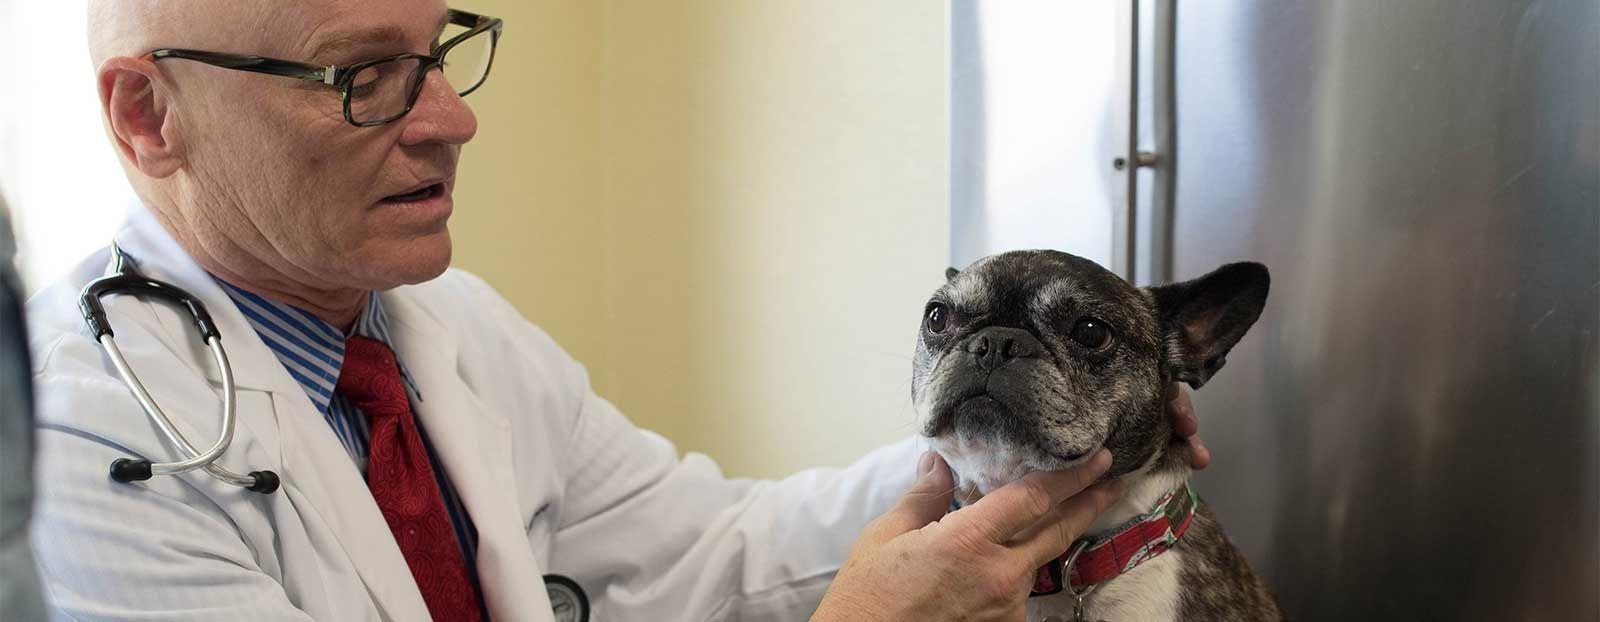 Care Animal Hospital - Joe Alcorn